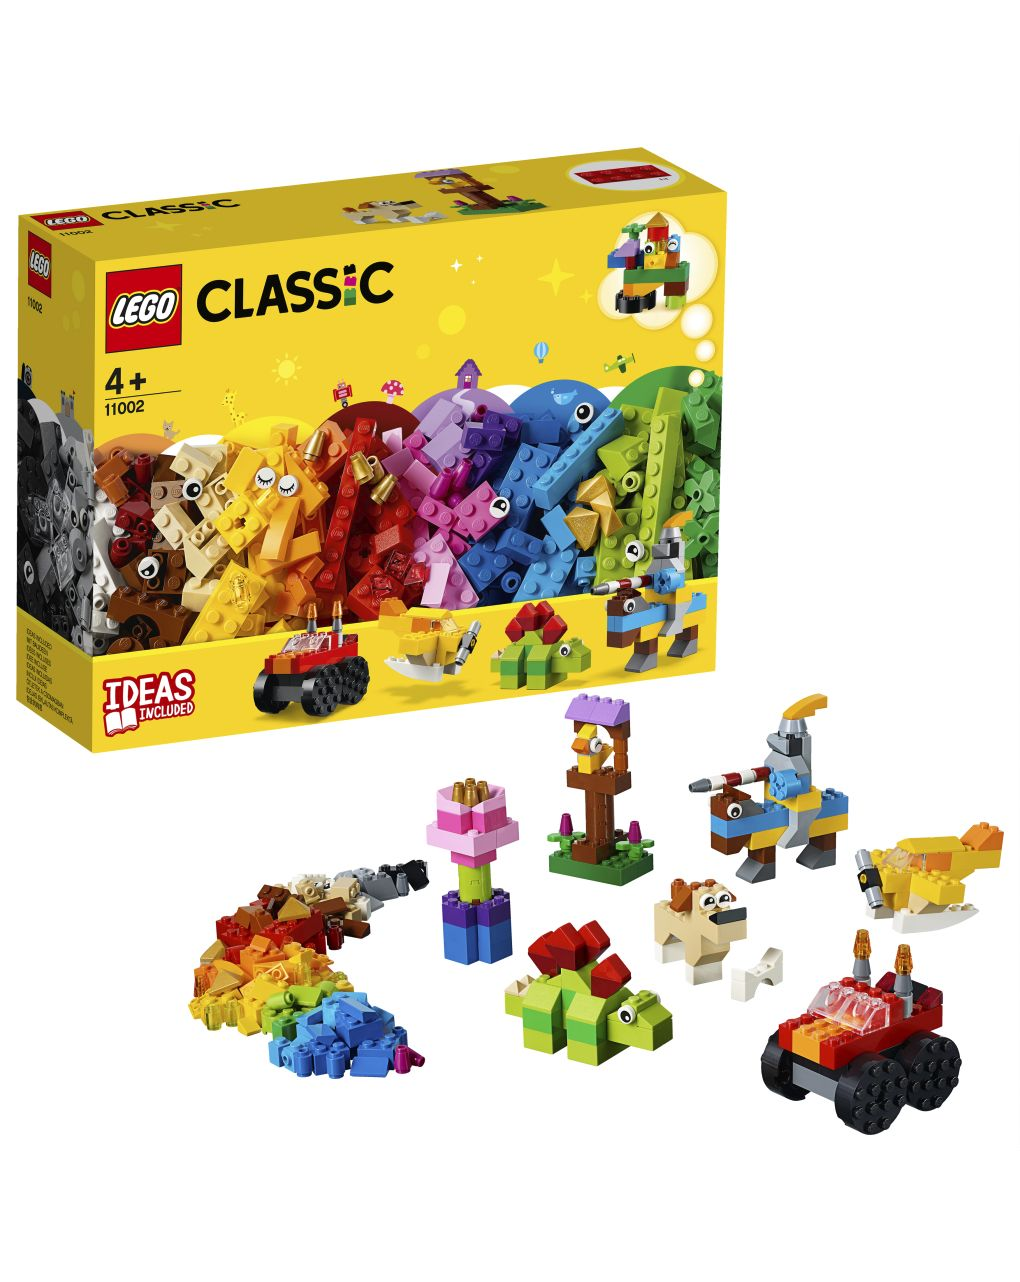 Lego classic - set di mattoncini di base - 11002 - LEGO